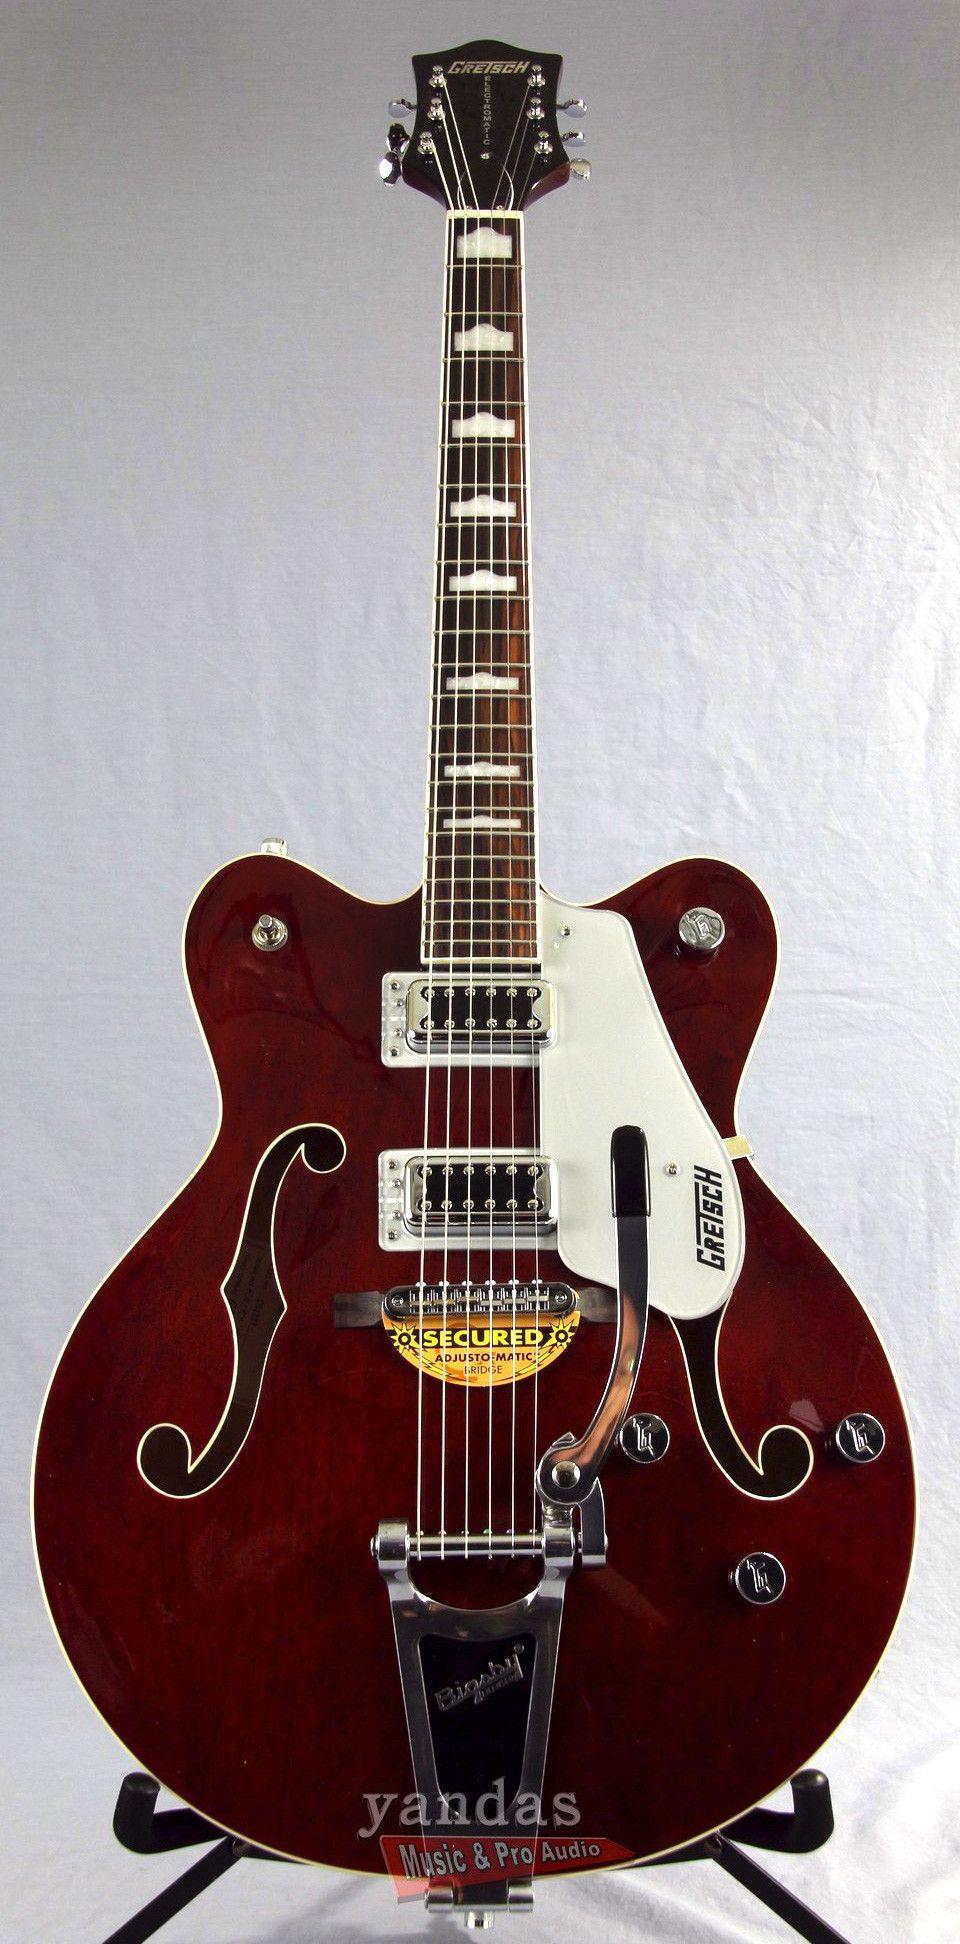 Gretsch G5422TDC Electromatic Hollow Body Guitar.